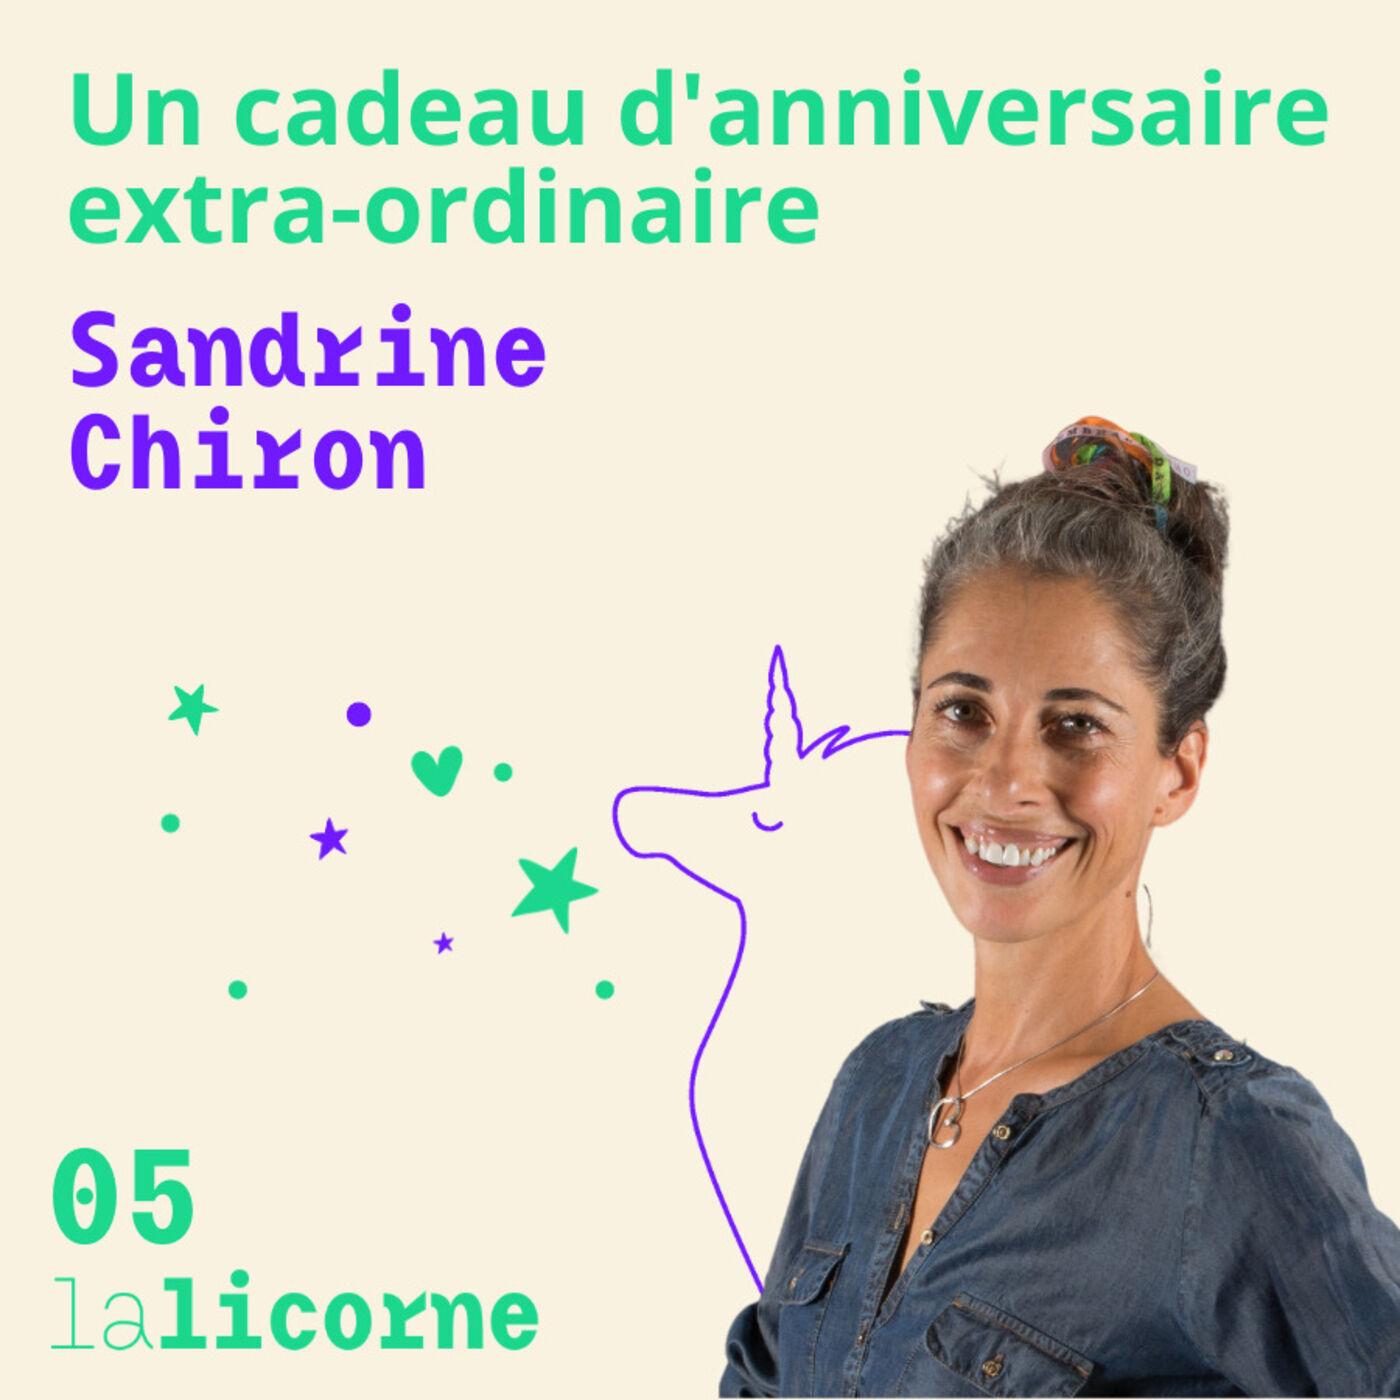 Episode 5 🎁 Sandrine Chiron - Un cadeau extra-ordinaire